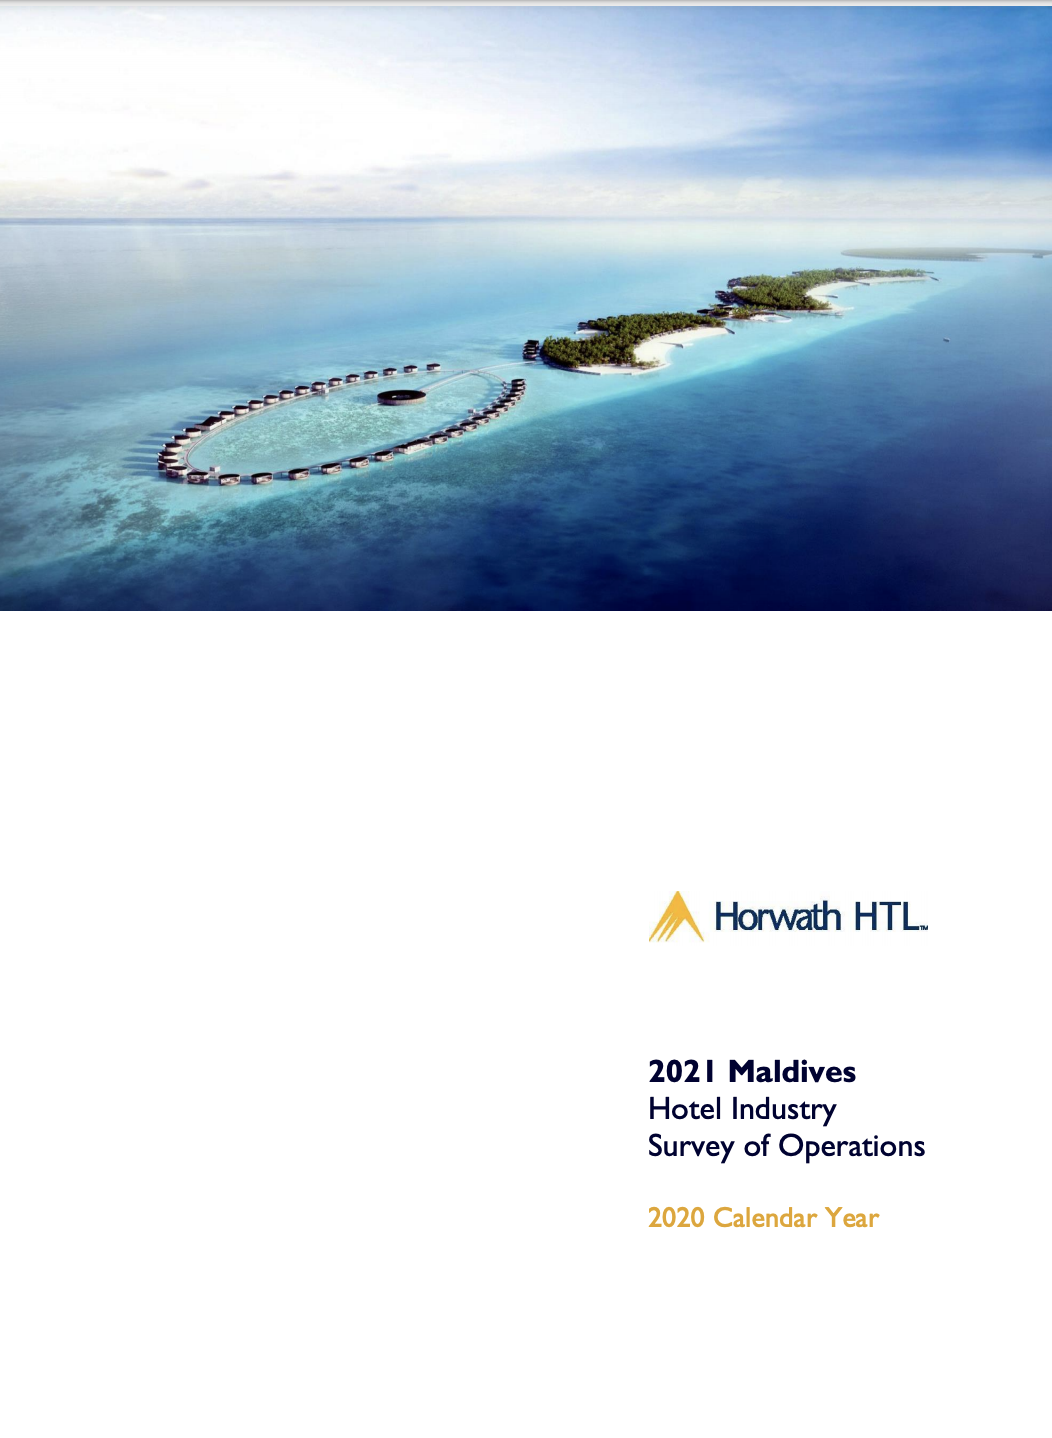 Maldives survey of operations 21